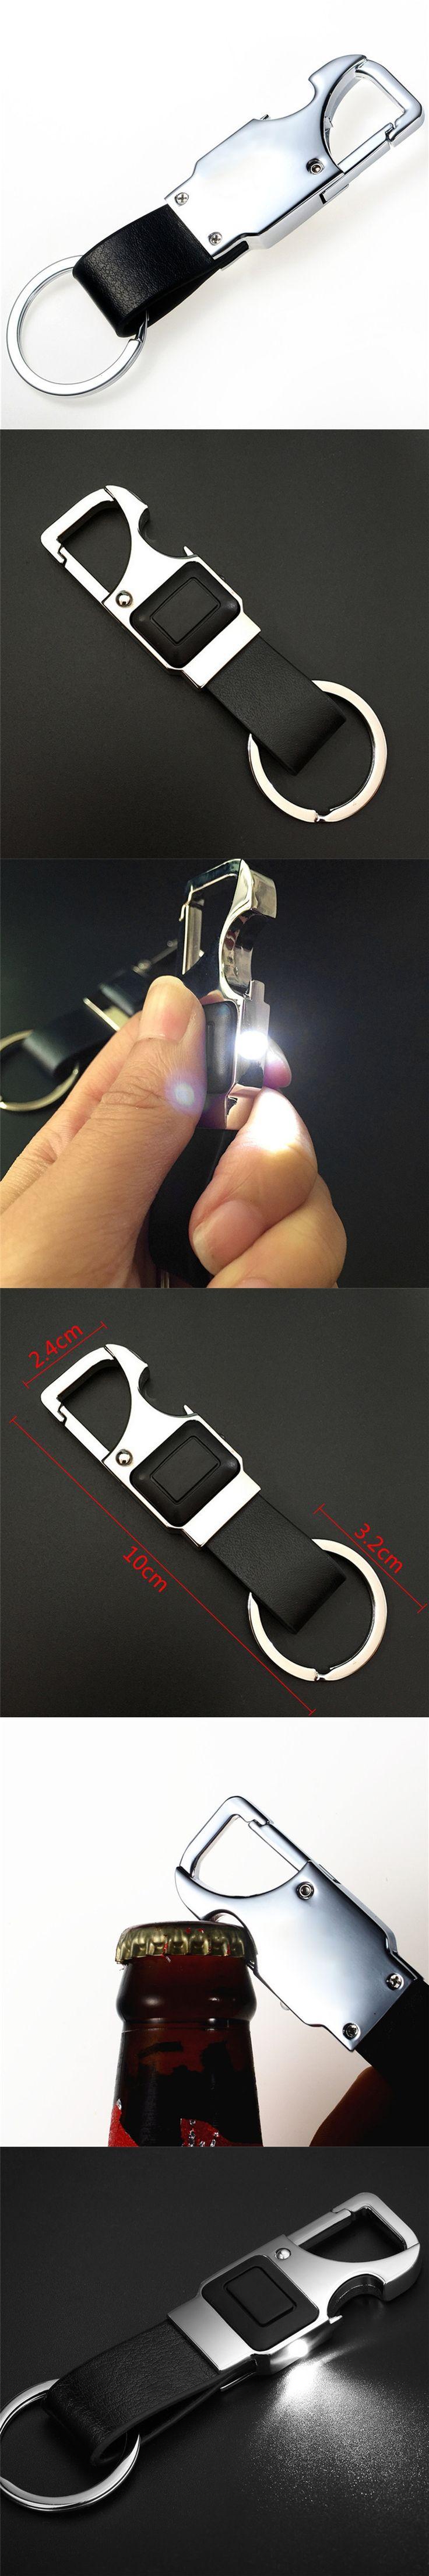 Auto LED Leather Key Chain Metal Car Key Ring Multifunctional Tool Bottle Opener Keychain Key Holder For BMW Audi Chaveiro VW